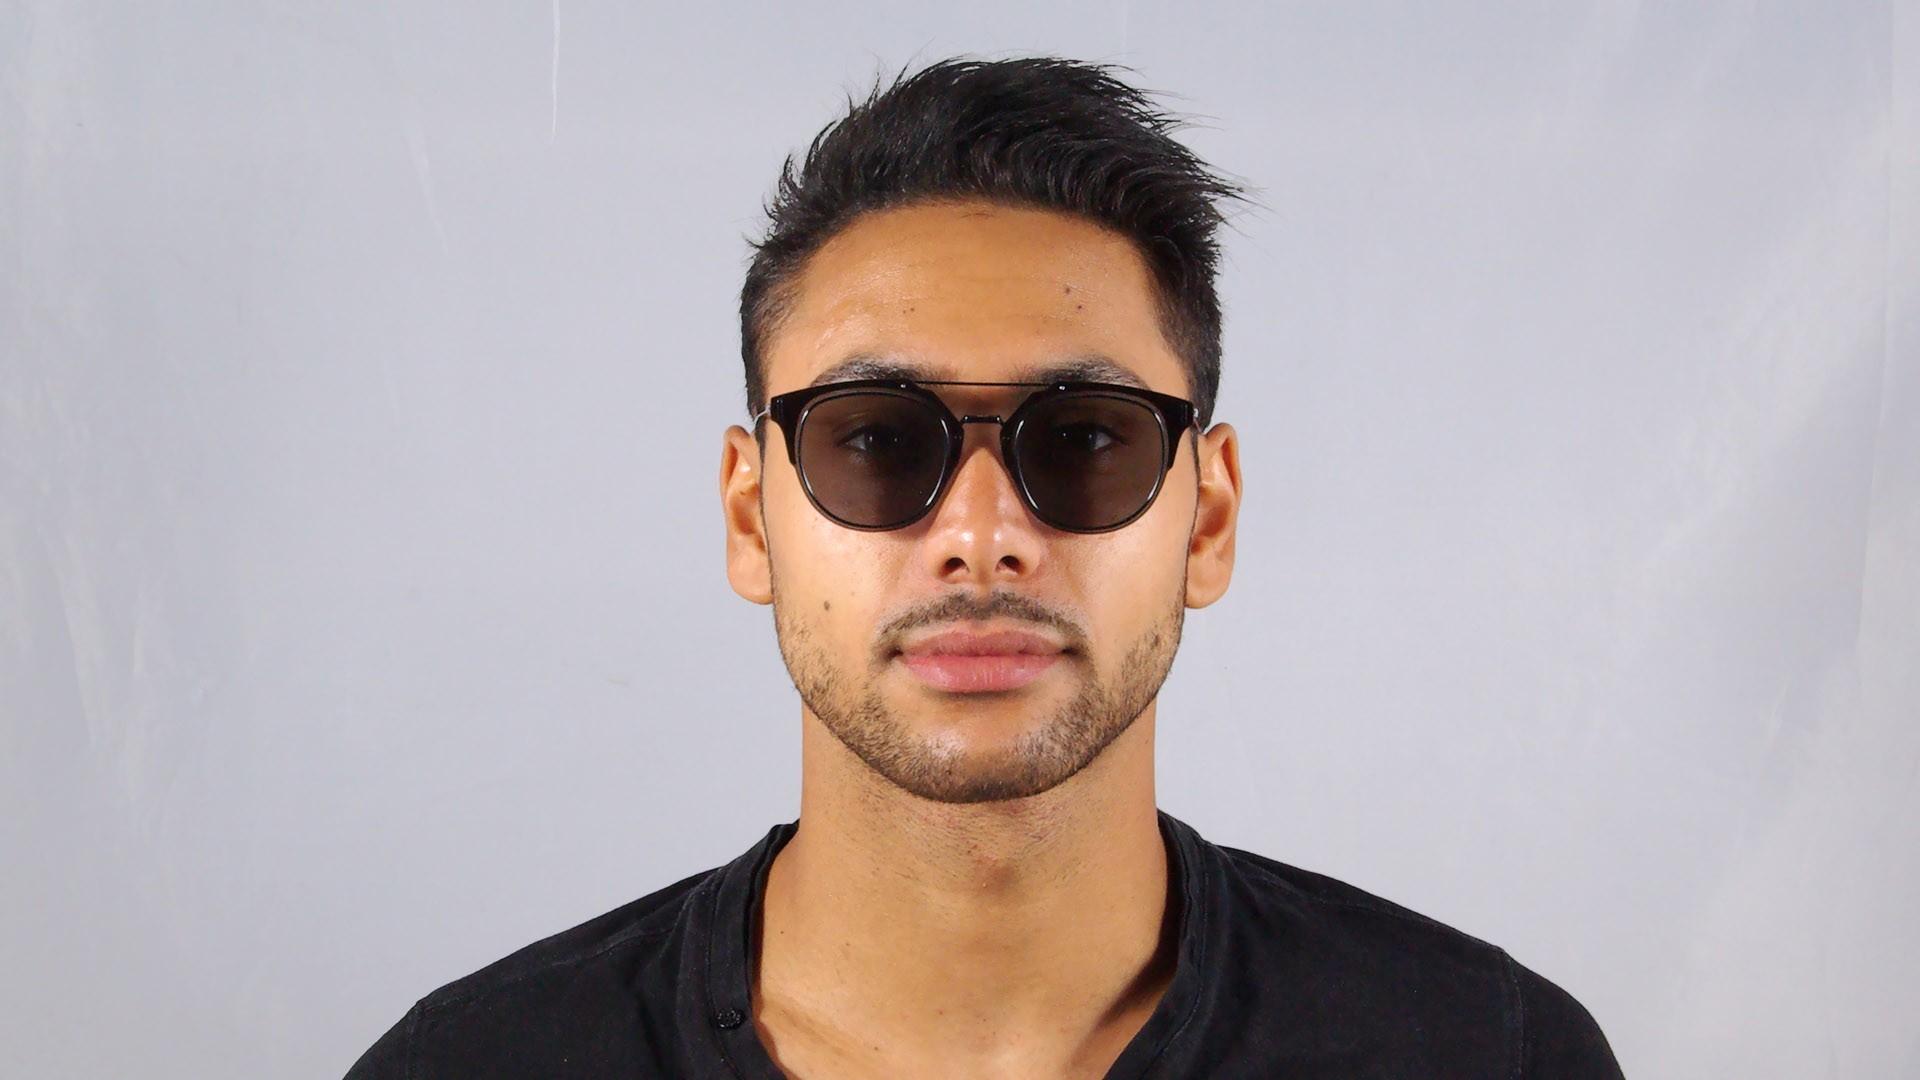 78f39afc3e6 Sunglasses Dior Composit Black 1.0 006 2K 62-12 Large